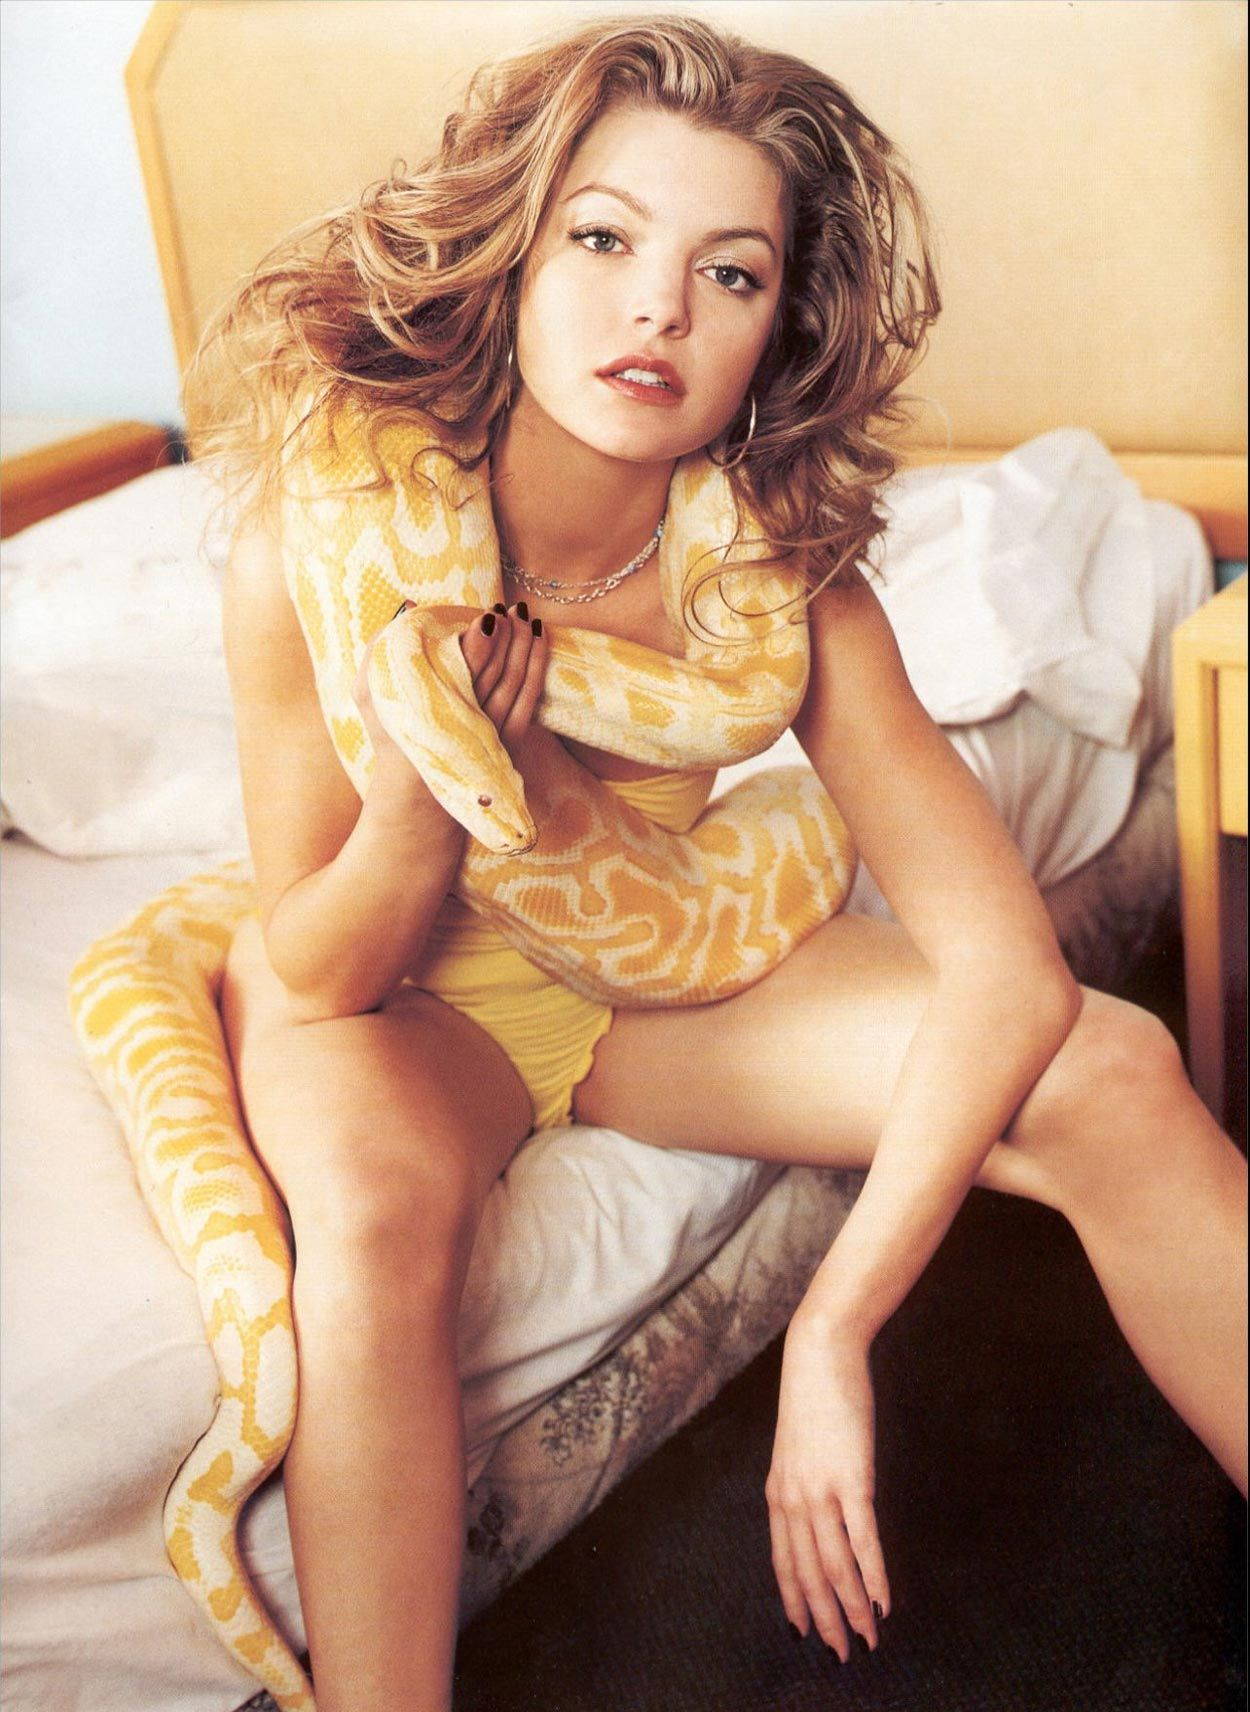 Joanna Riding,Caroline Bliss XXX nude Diane Farr,Danny Dyer (born 1977)